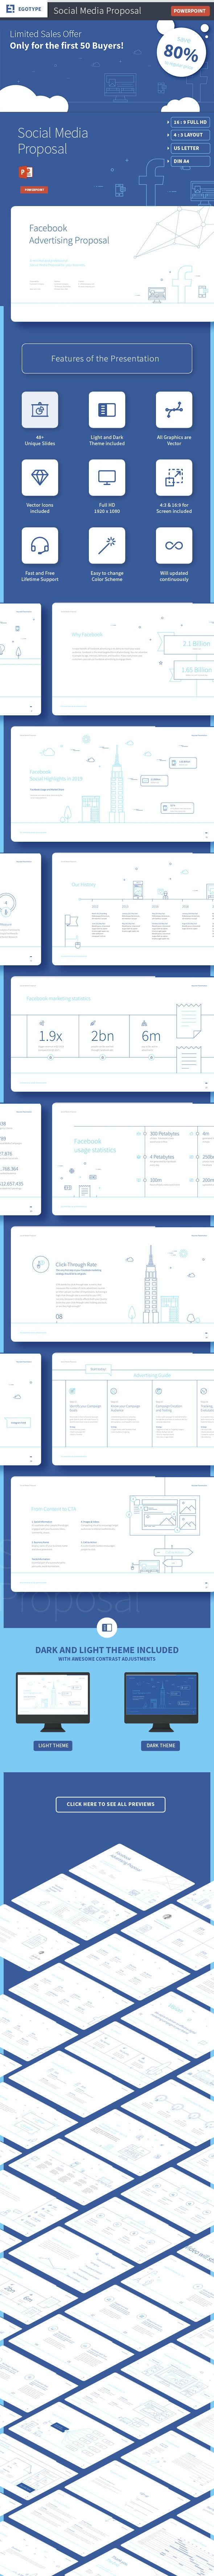 Social Media Presentation Template - Business PowerPoint Templates